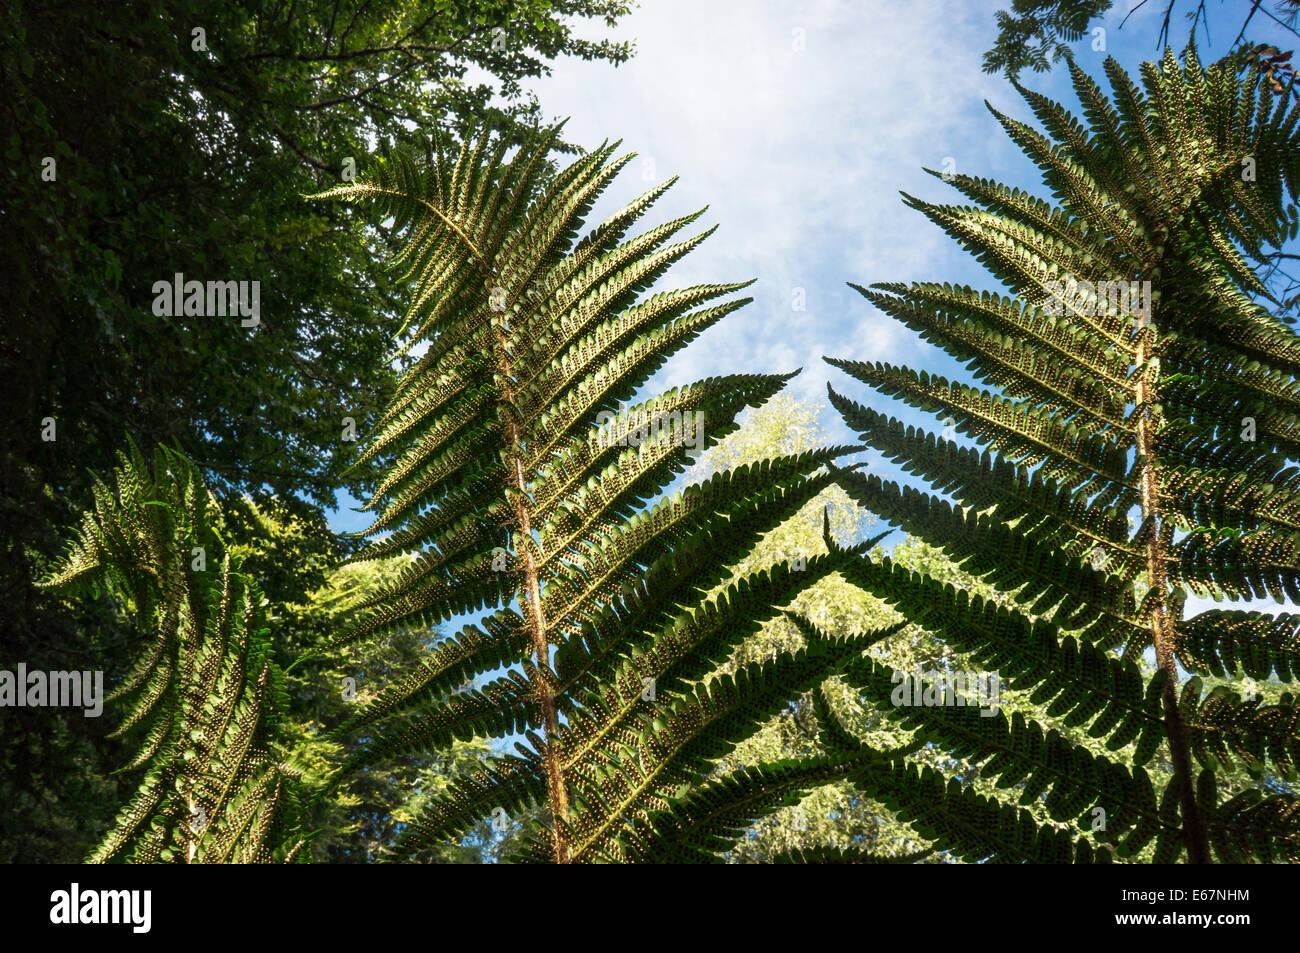 Helecho escamoso ( Dryopteris affinis) Imagen De Stock